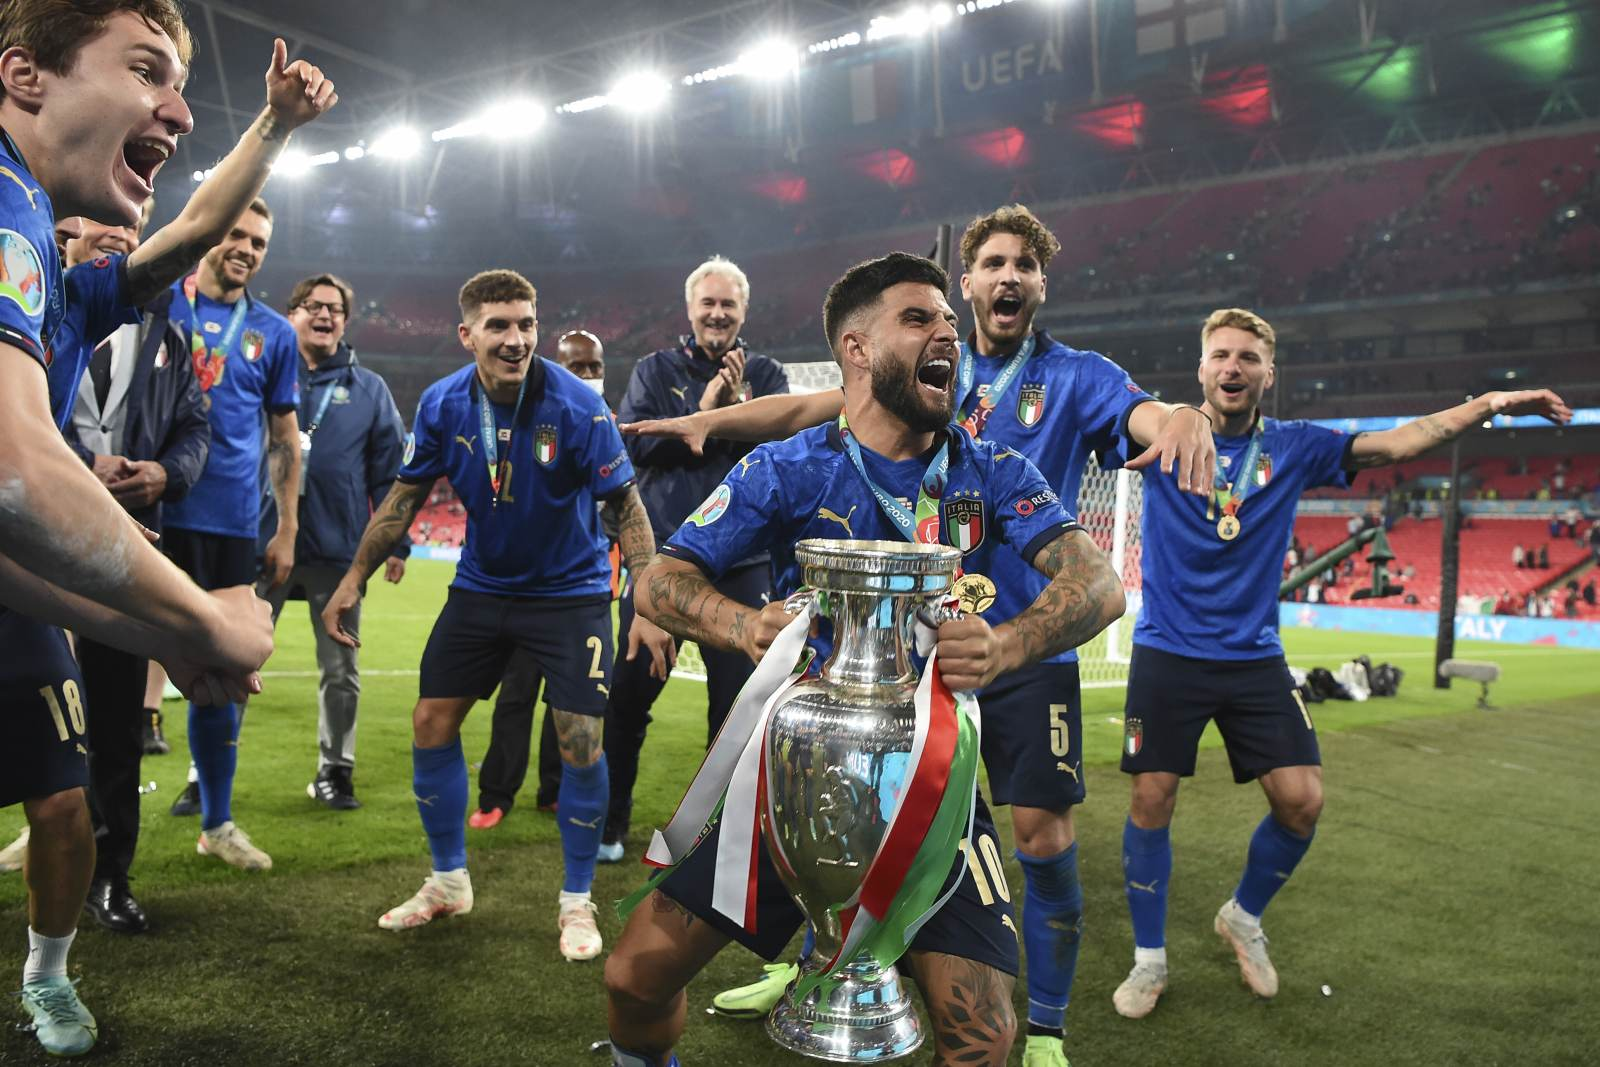 Петиция за переигровку финала Евро-2020 активно собирает подписи